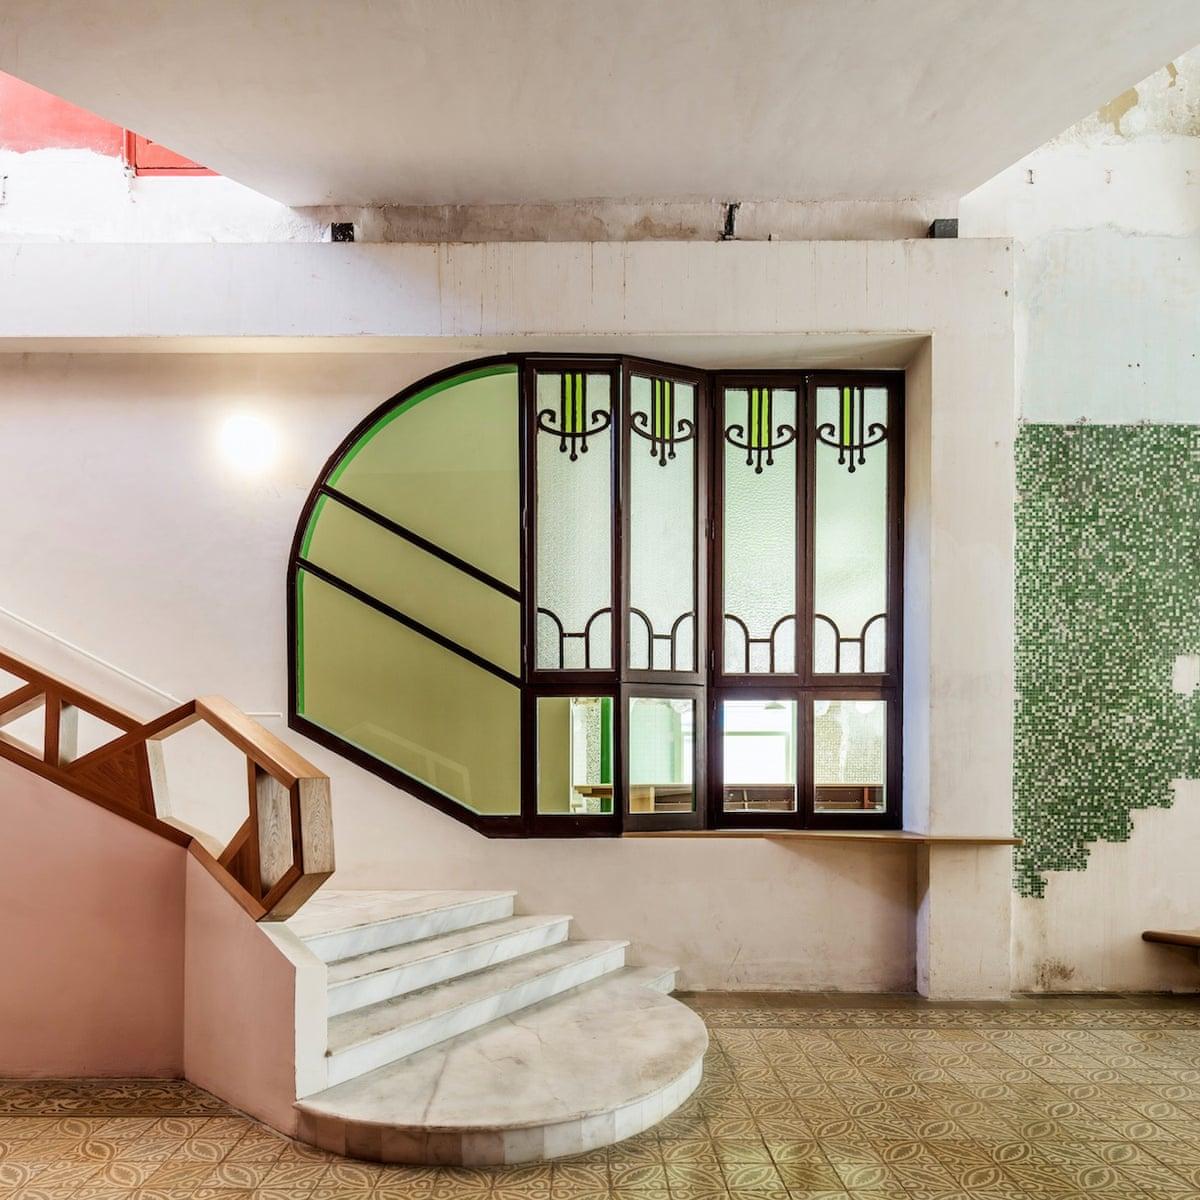 Piano Bar Per Casa sala beckett: barcelona's inspired homage to the playwright